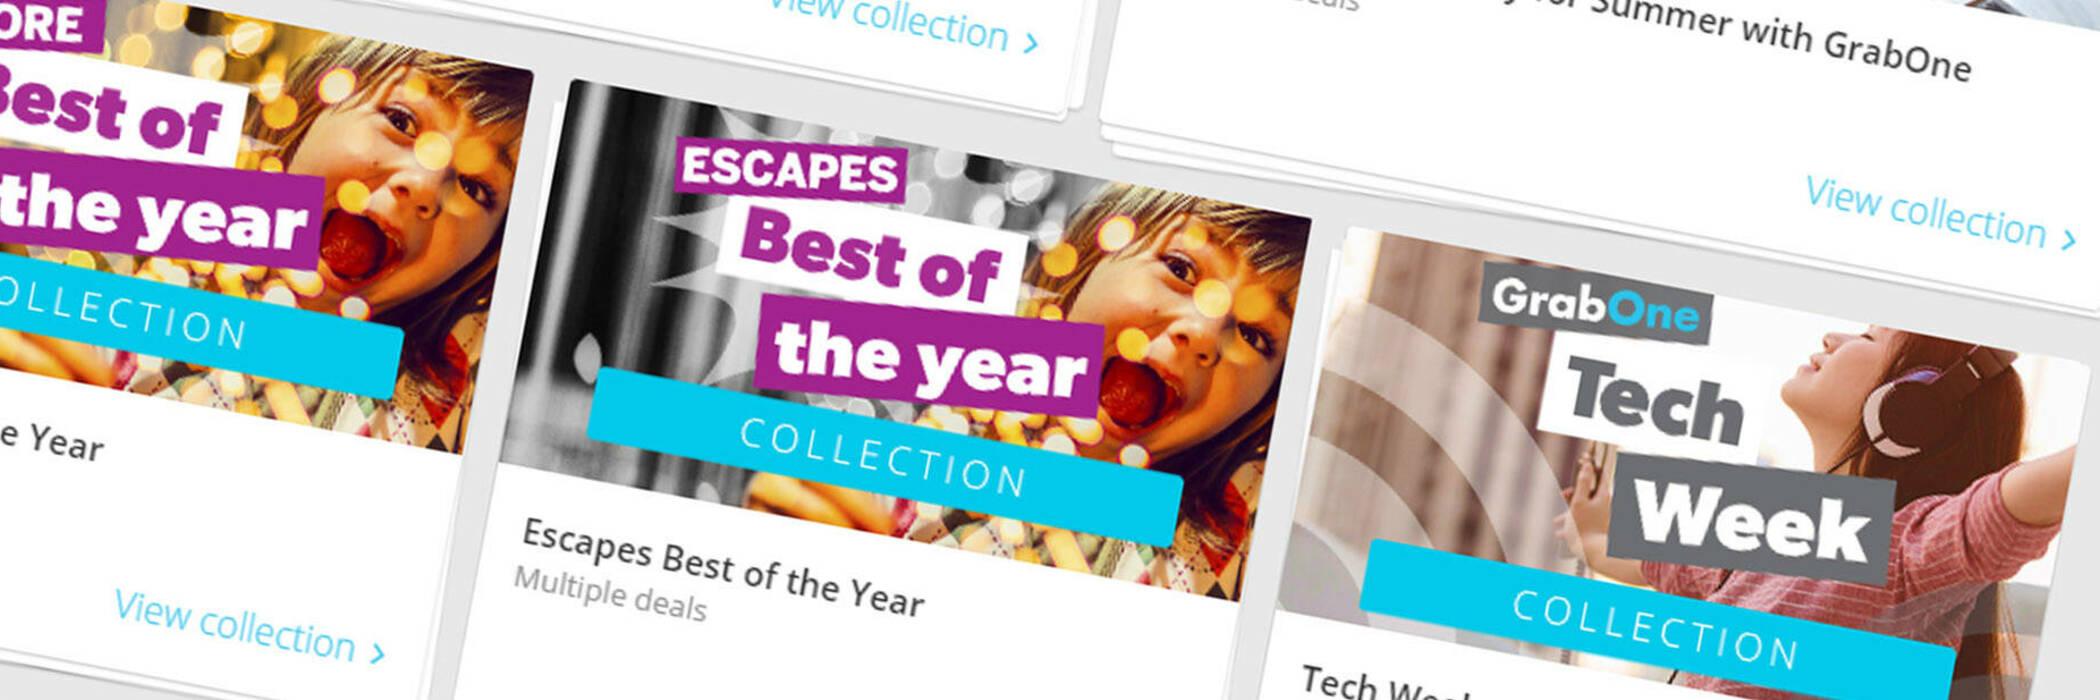 16dec daily deal websites cant escape consumer law hero